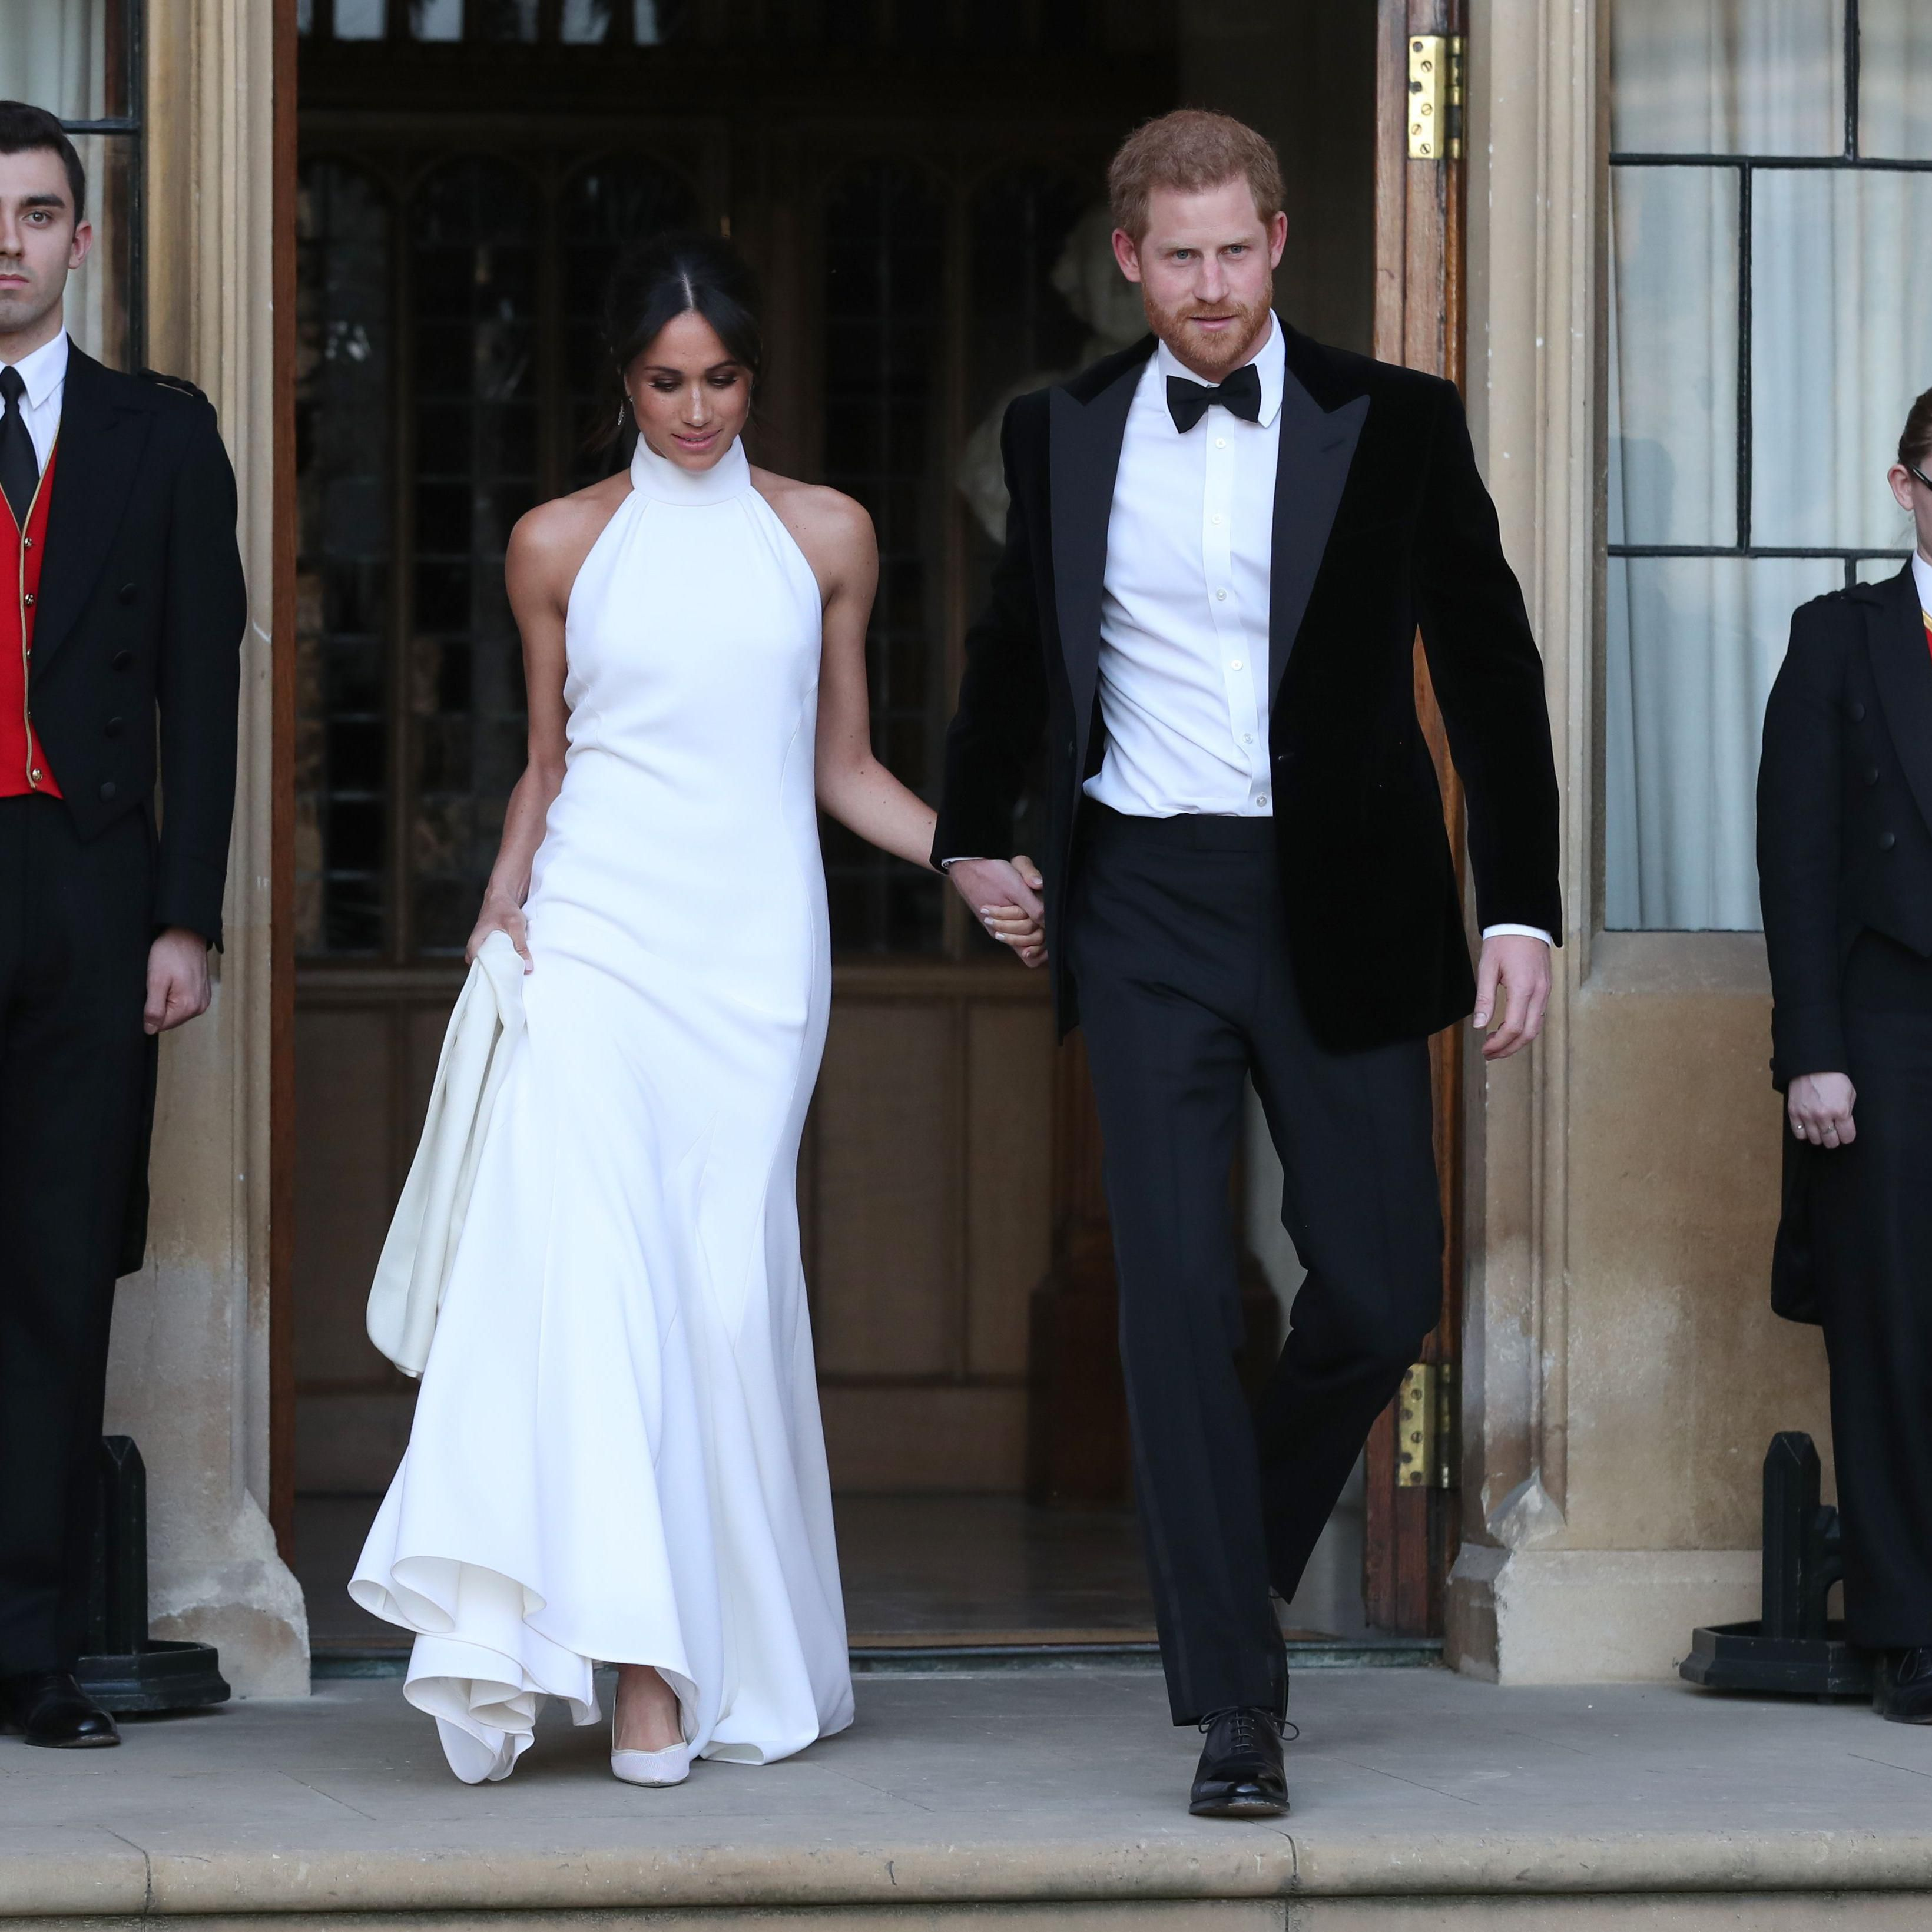 meghan markle s second royal wedding dress get the look second royal wedding dress